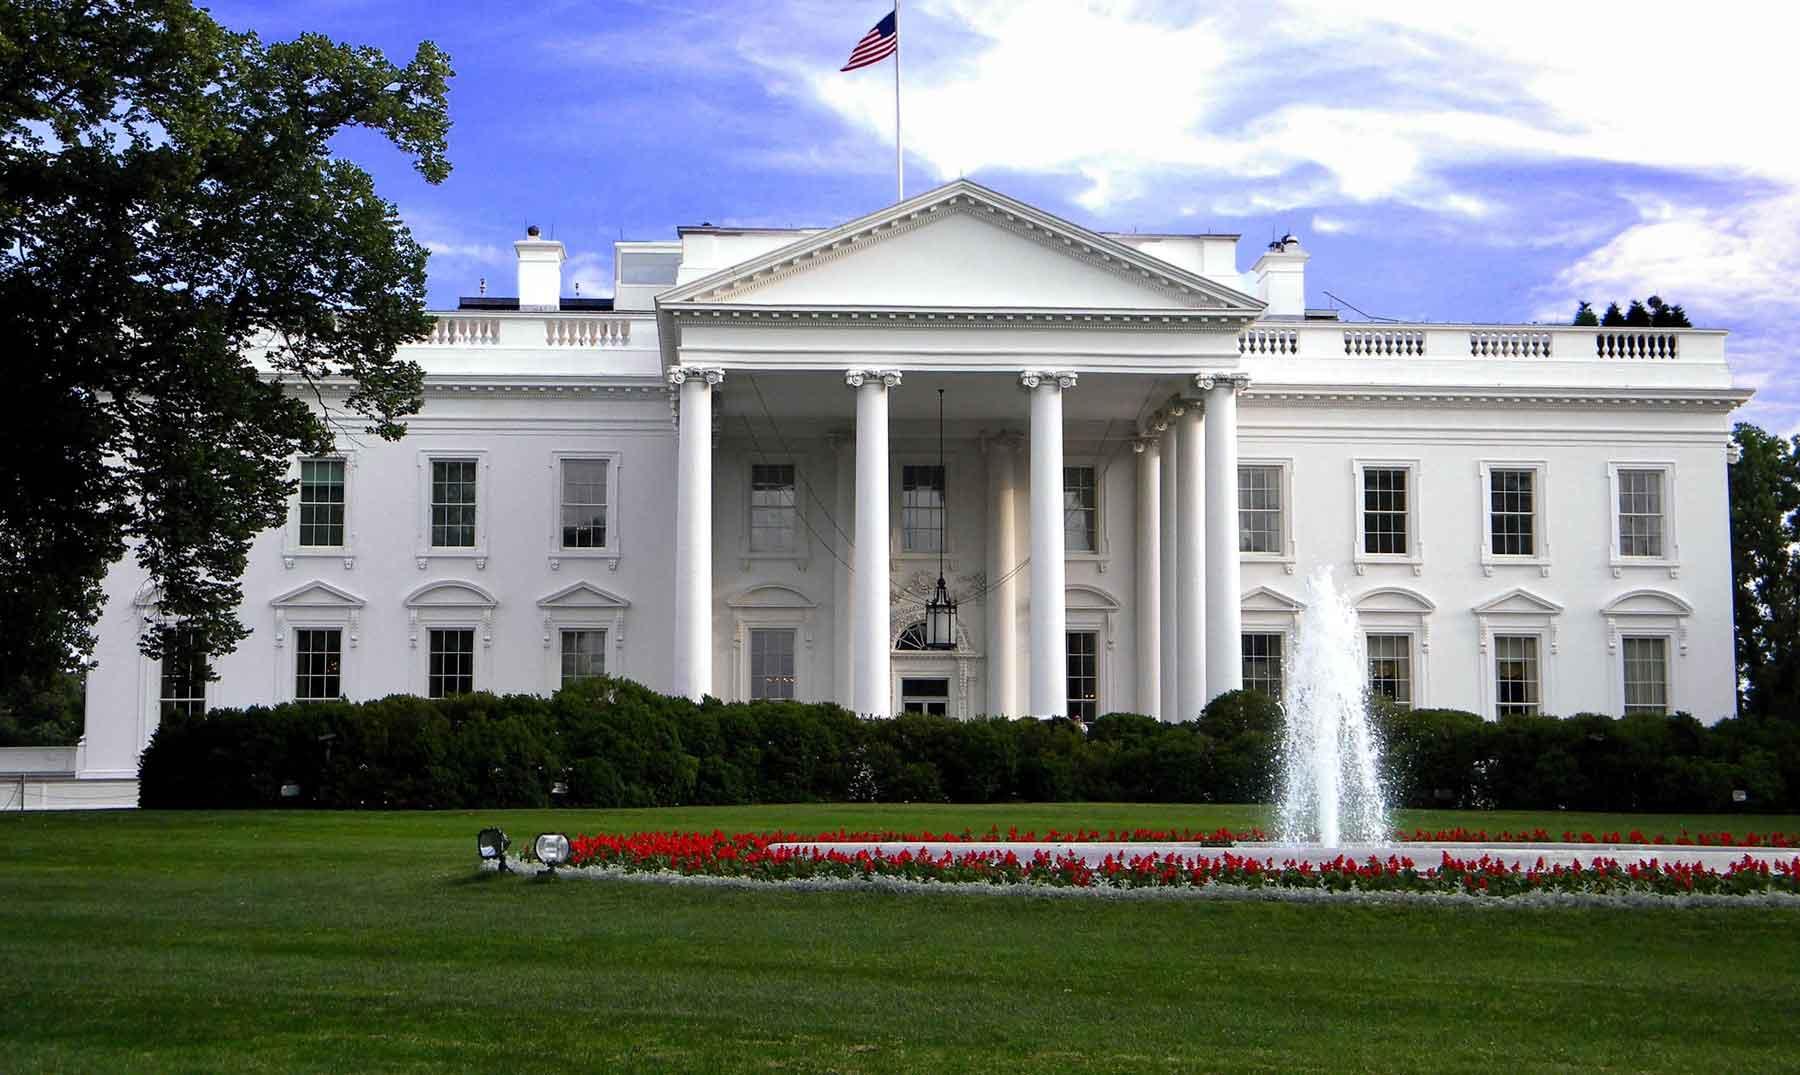 casa blanca 2